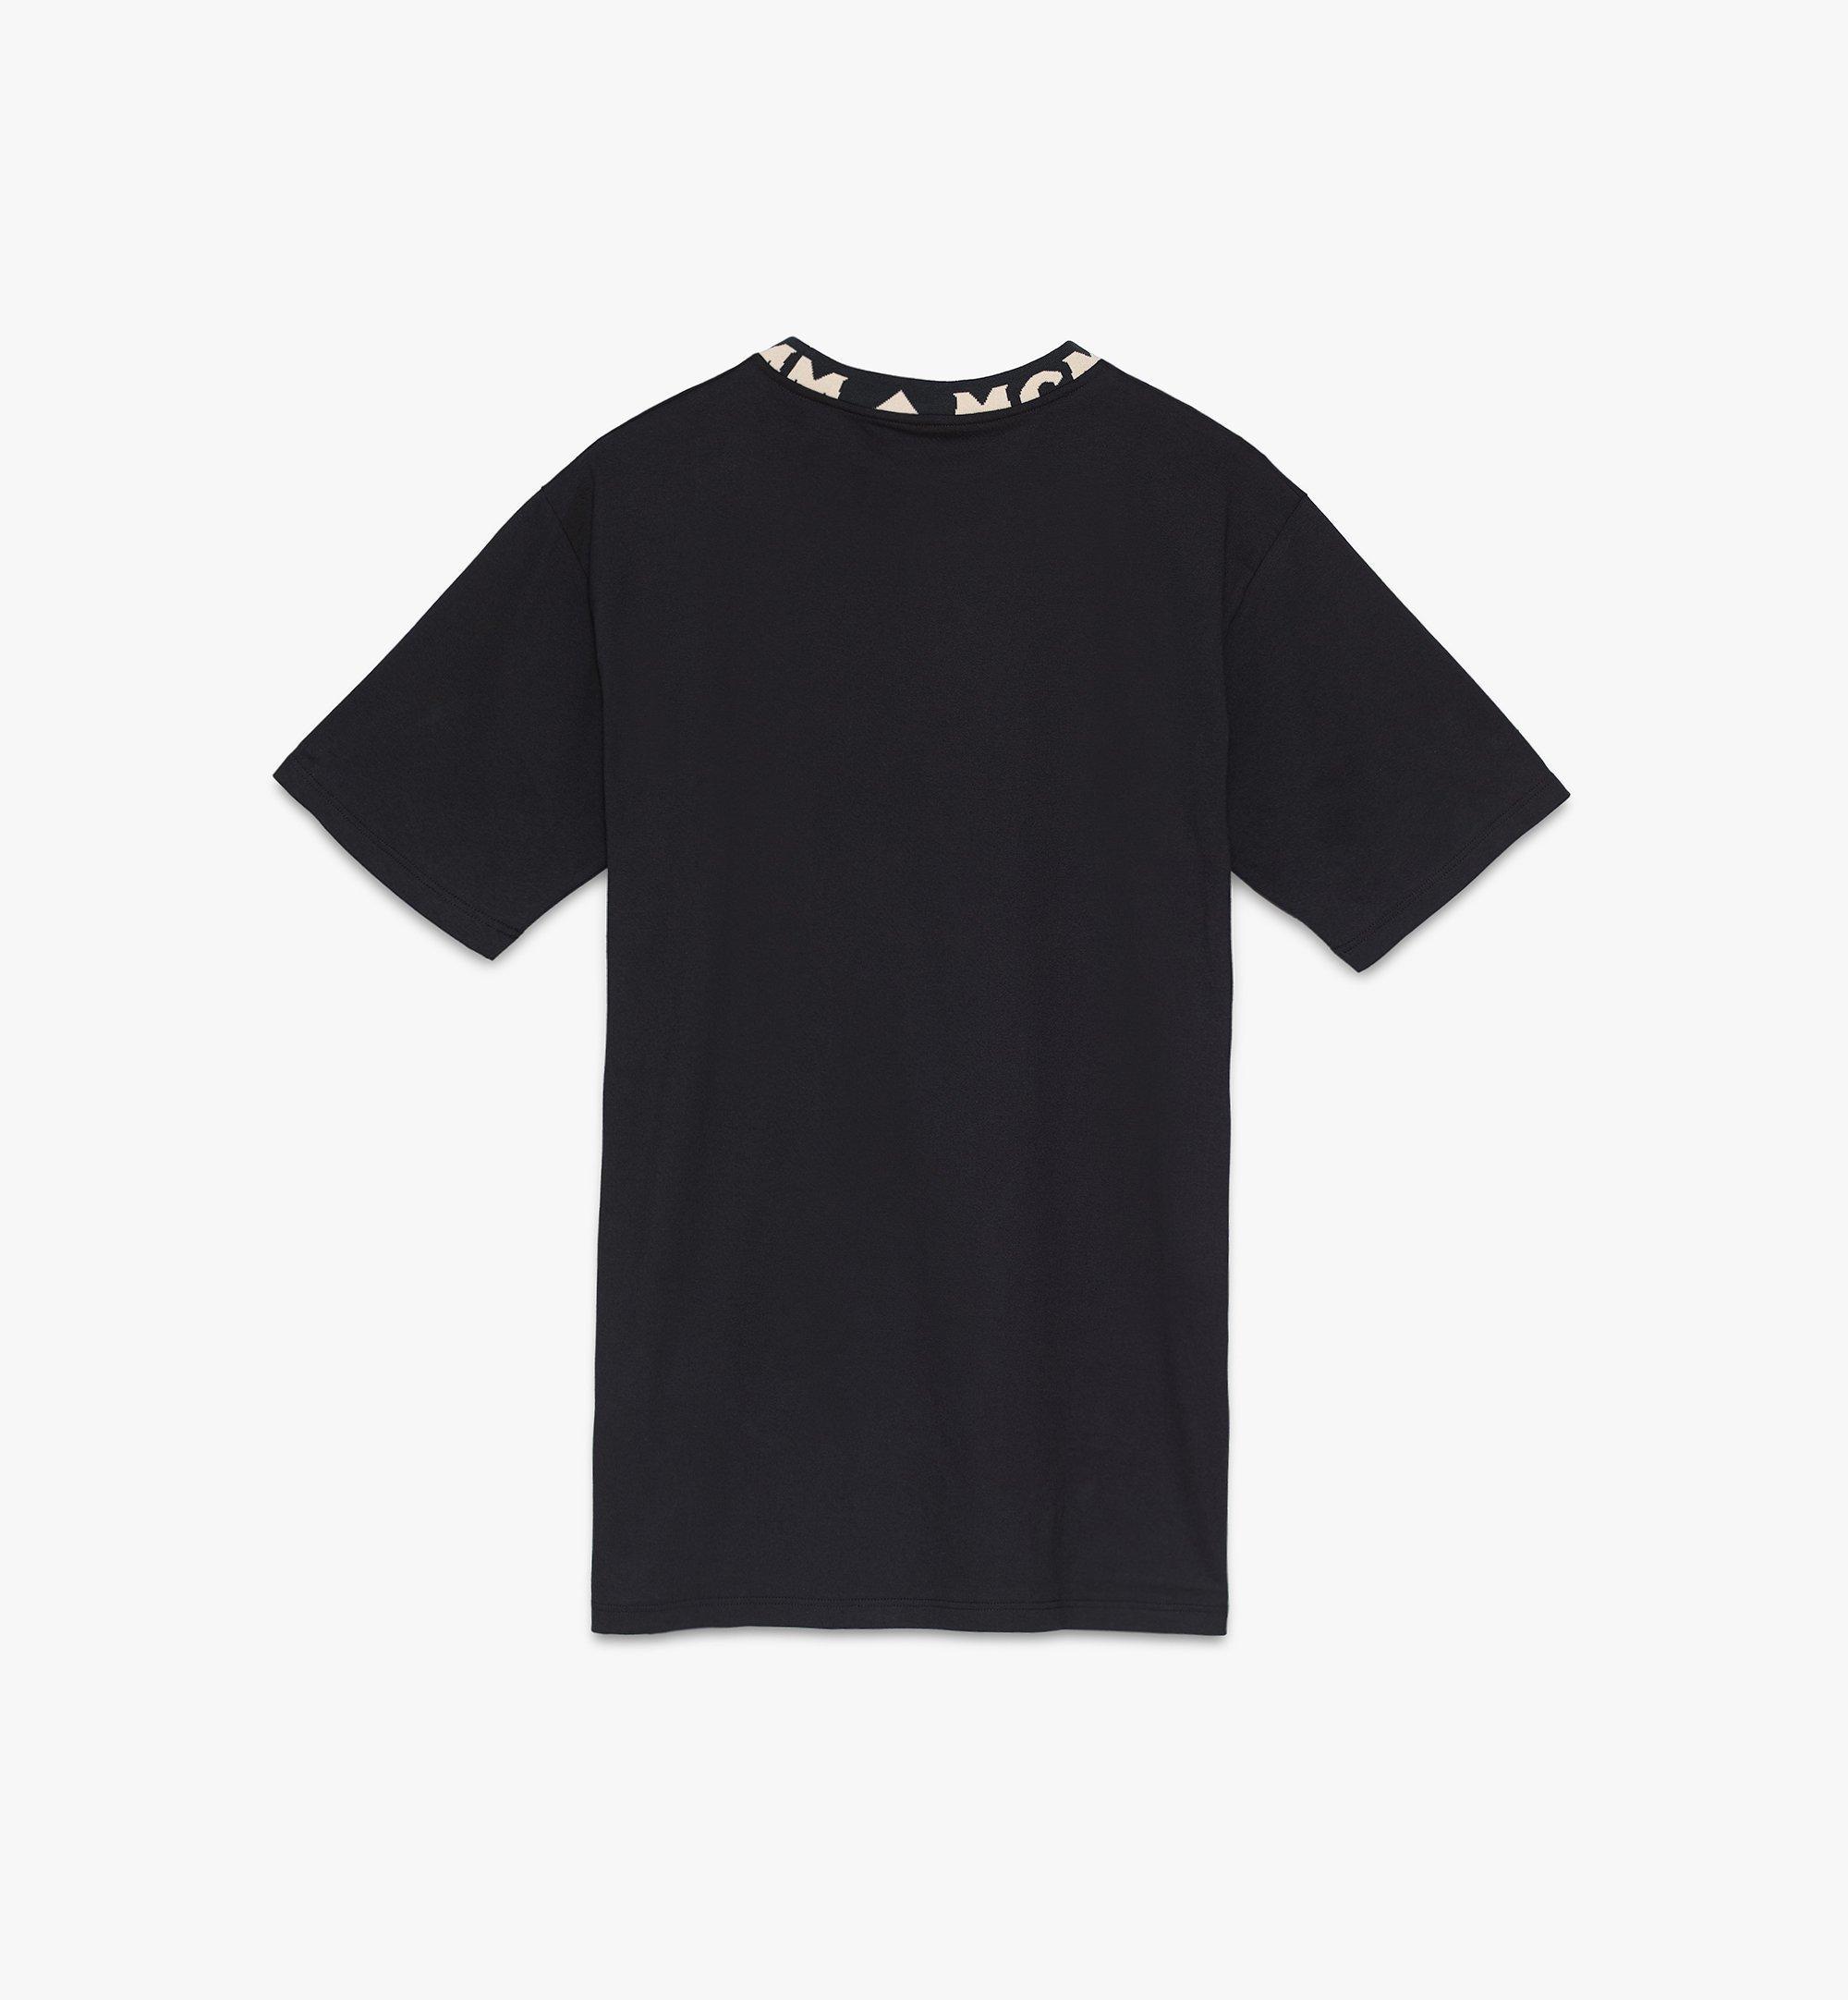 MCM メンズ ロゴトリム Tシャツ Black MHTASMM03BT00L Alternate View 2